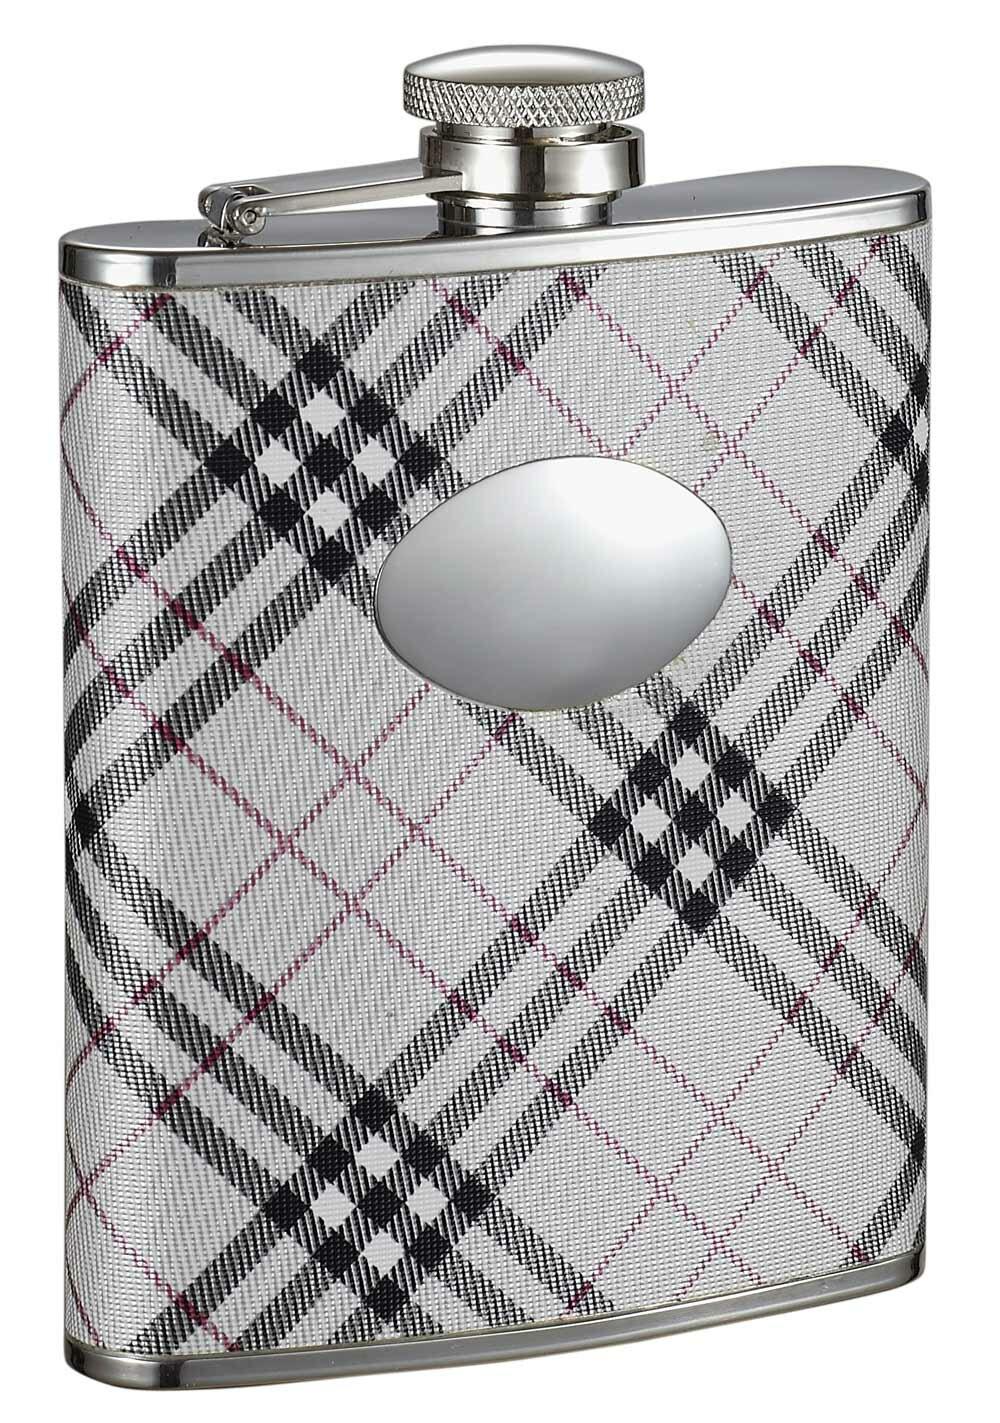 Visol Products Plaid Leatherette Stellar Hip Flask Wayfair